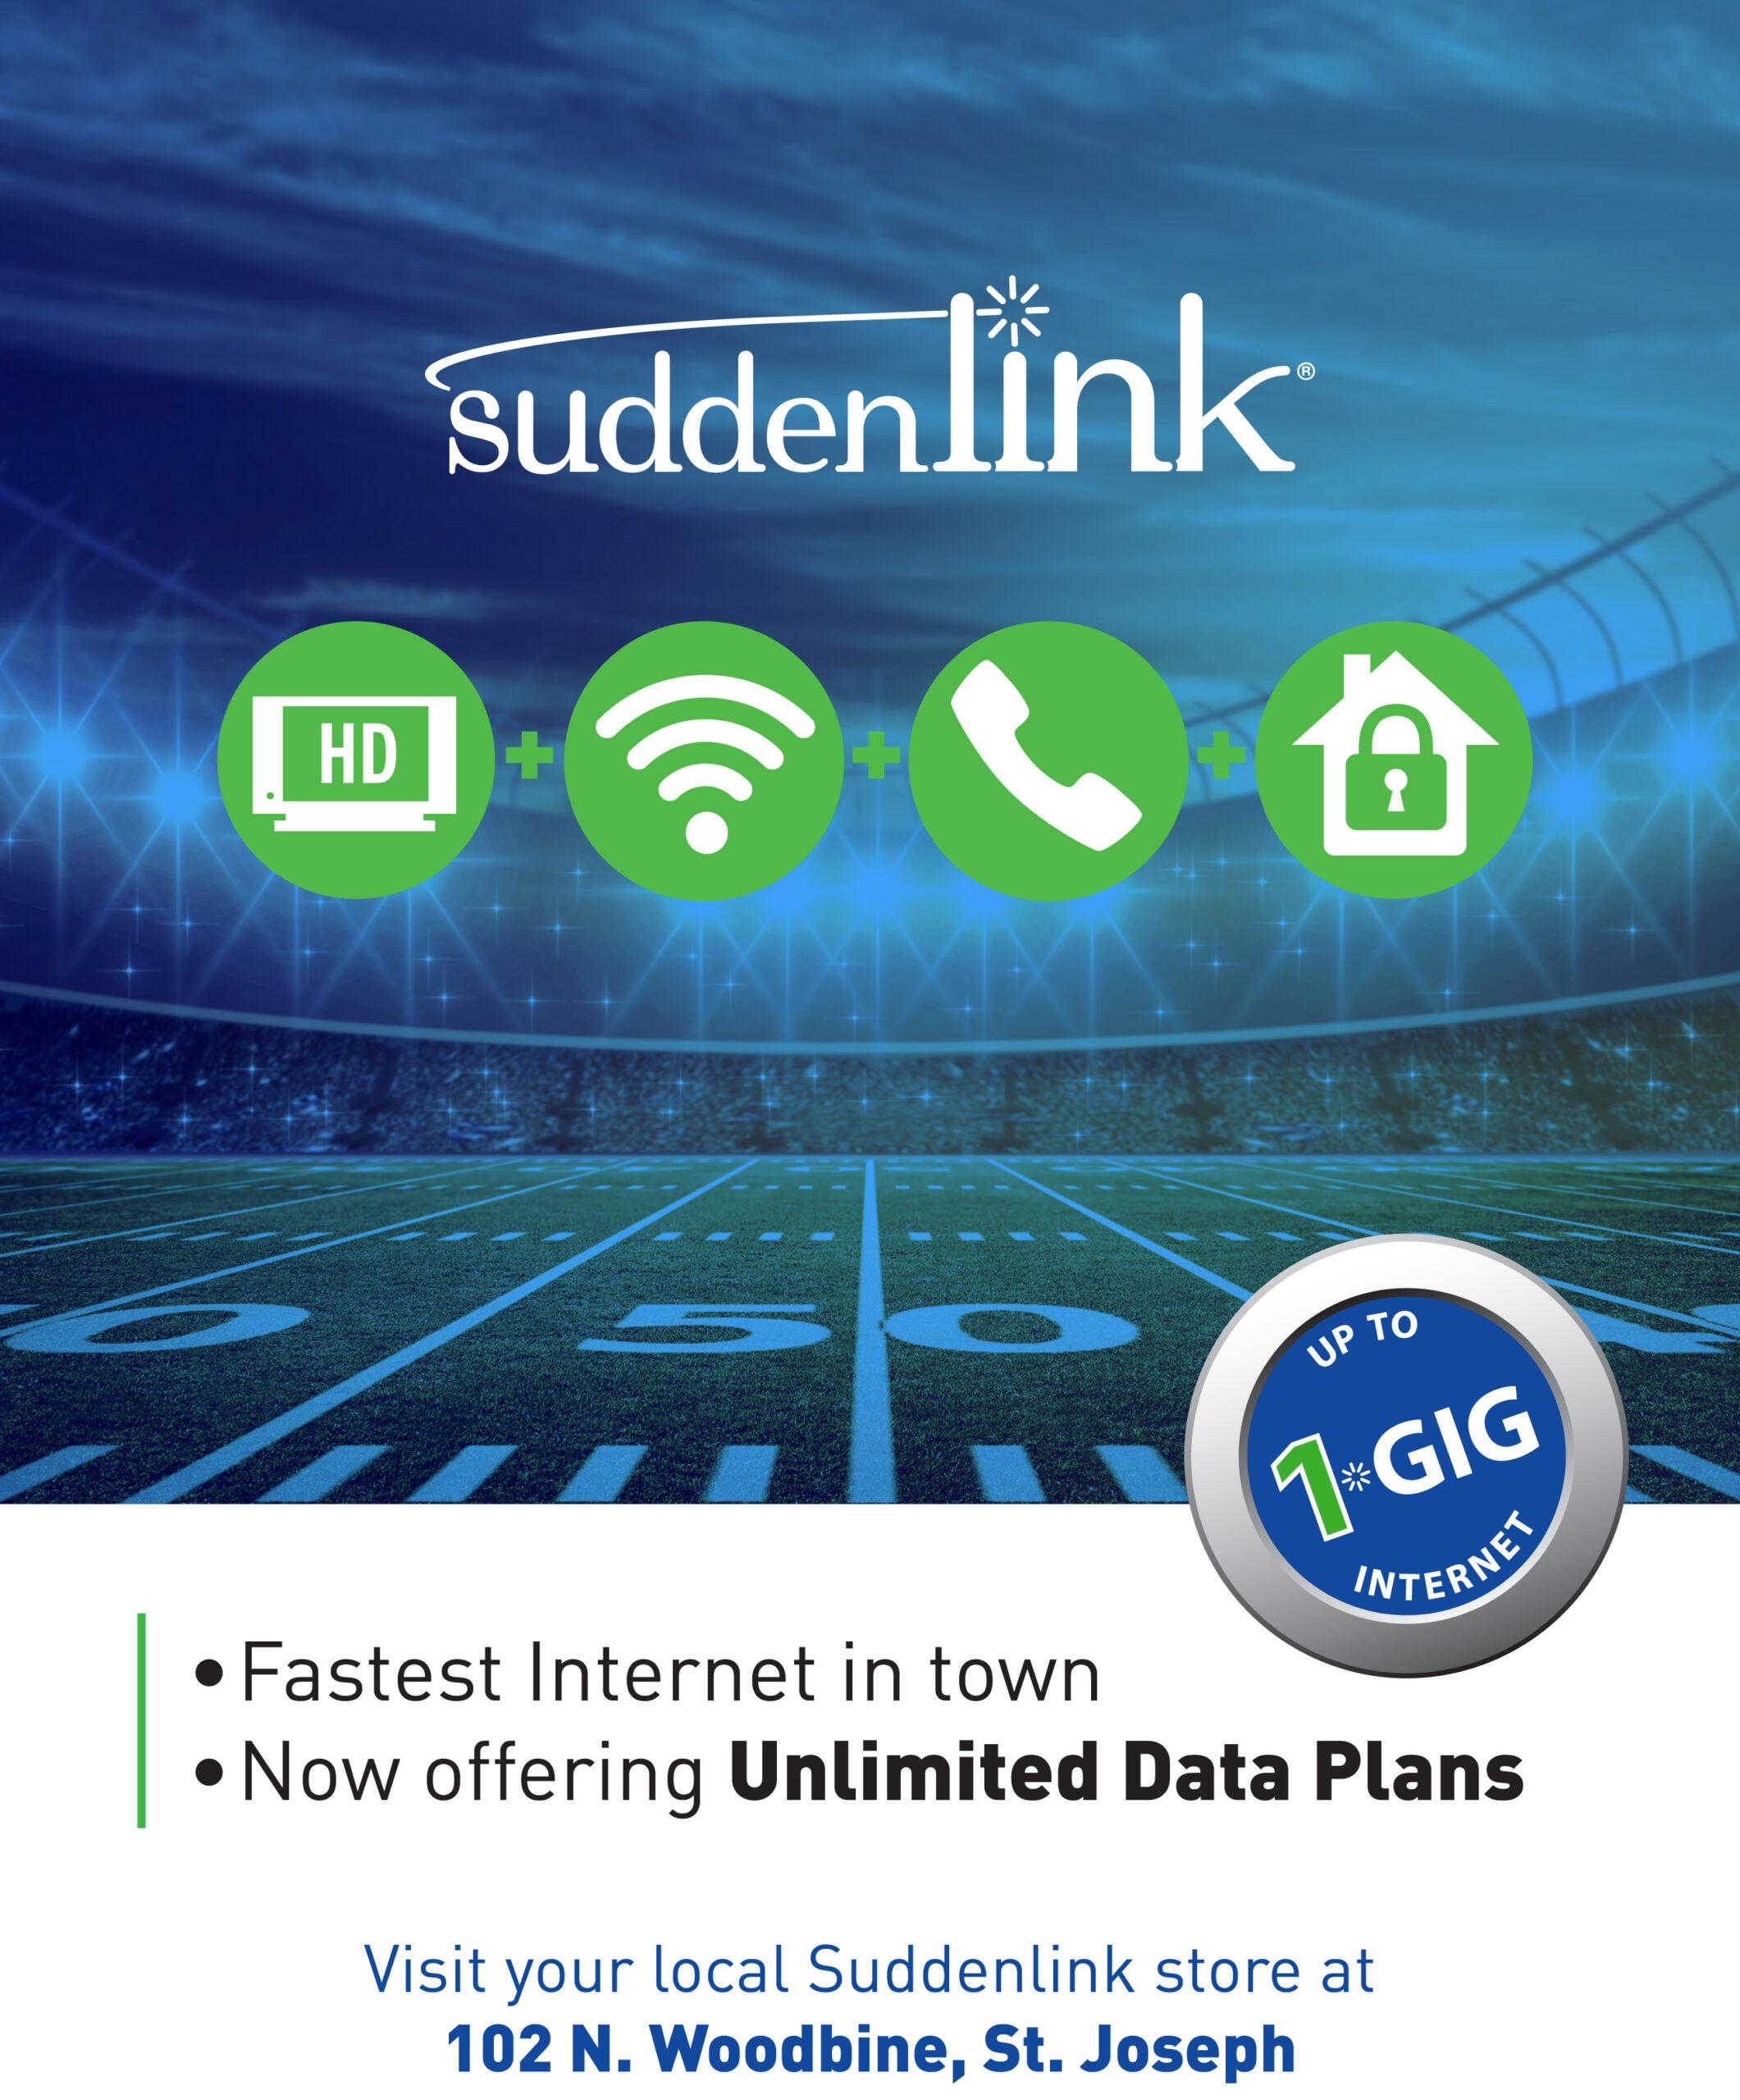 SuddenLink services over flotball field